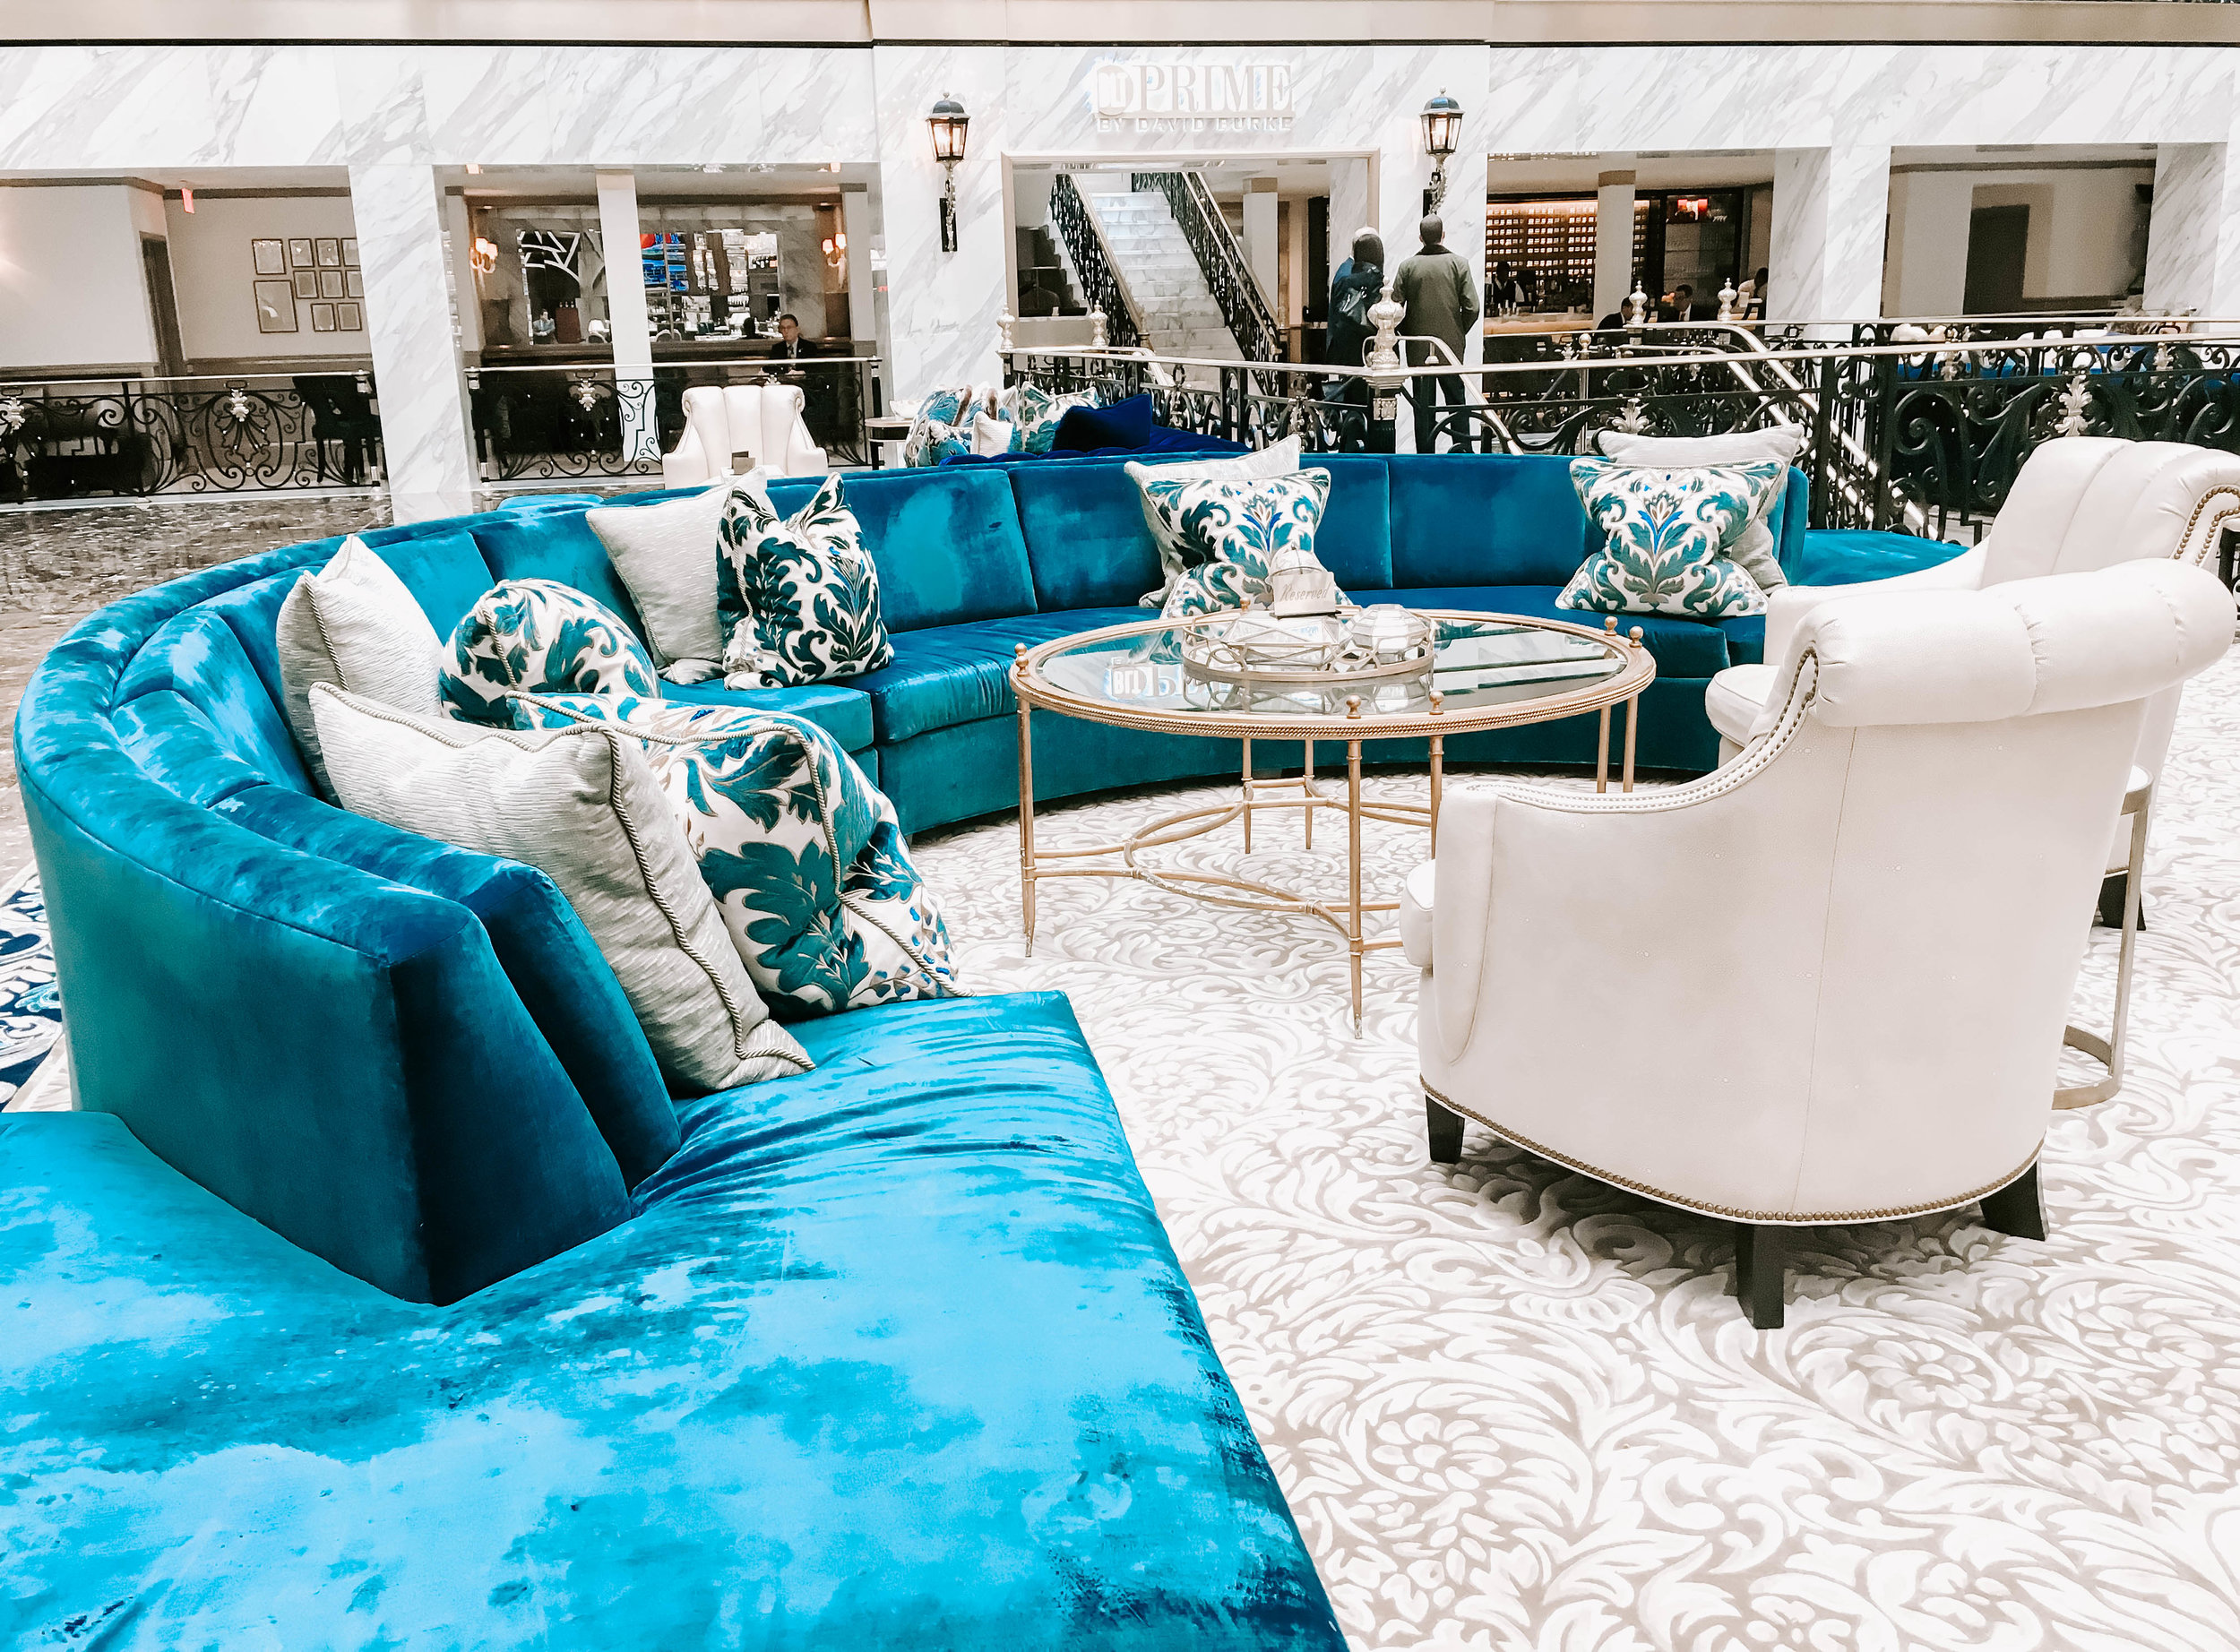 Trump Hotel Grand Lobby Interior.jpg